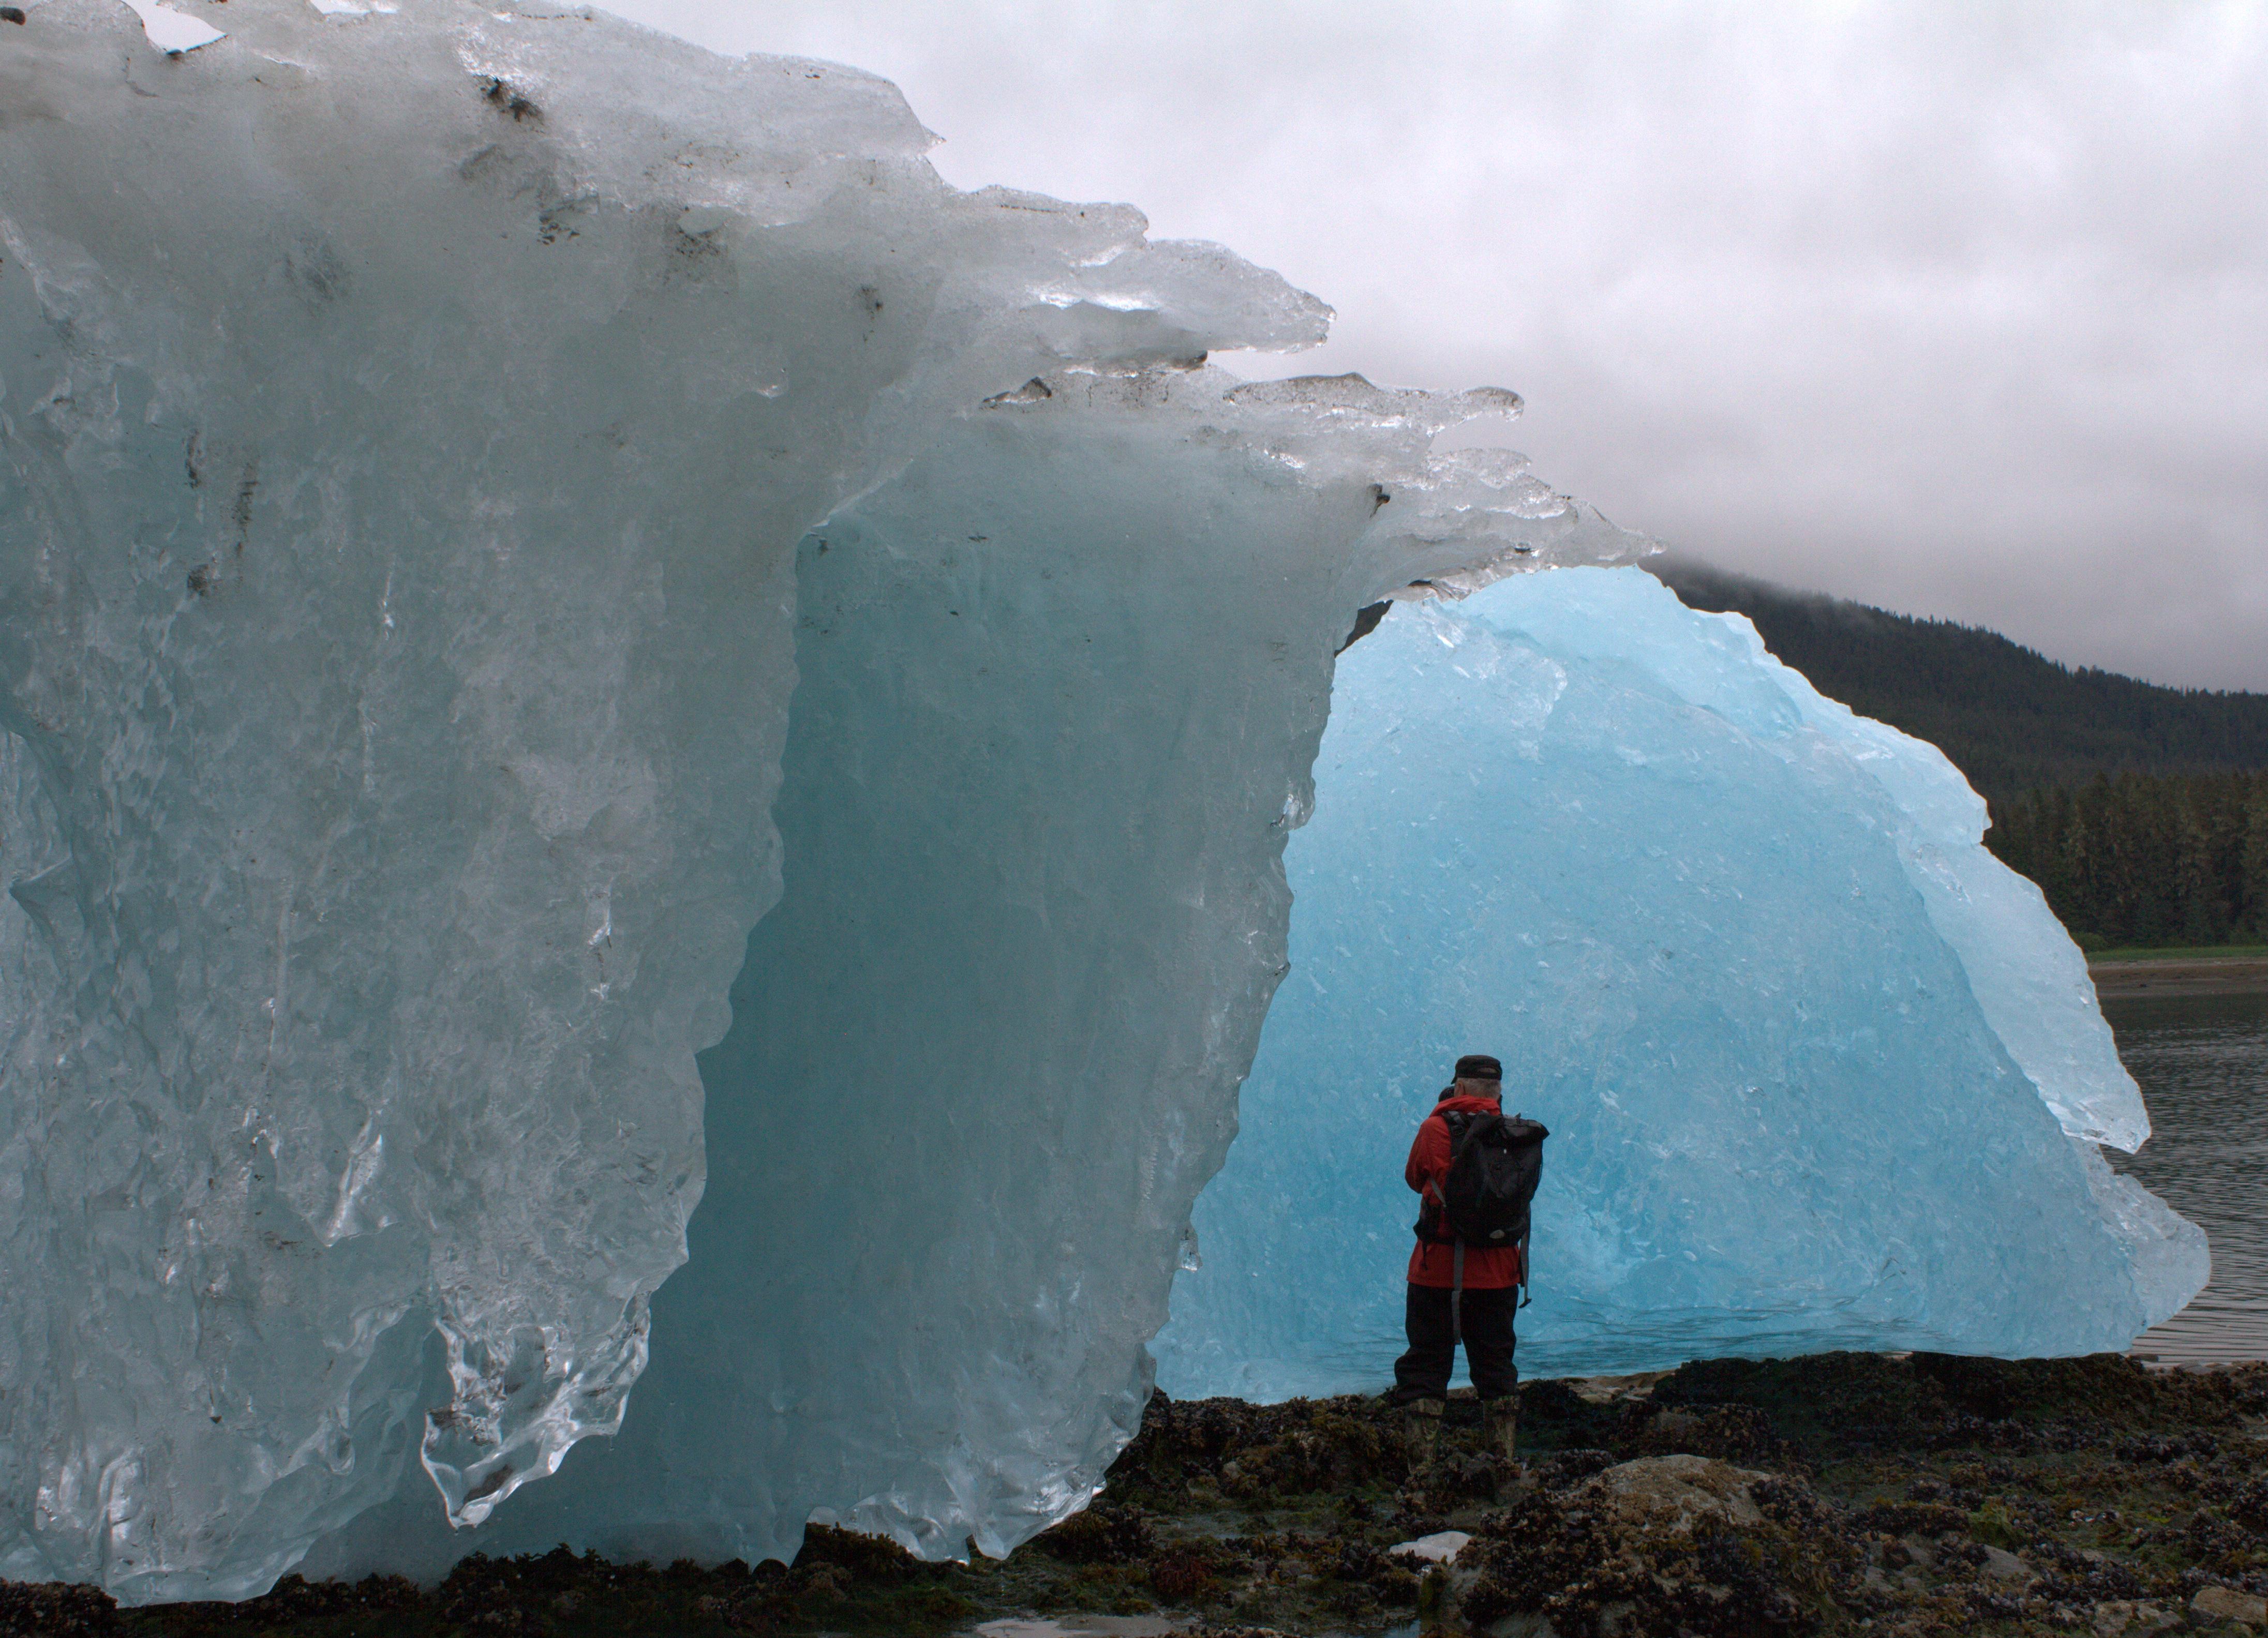 Beached Iceberg